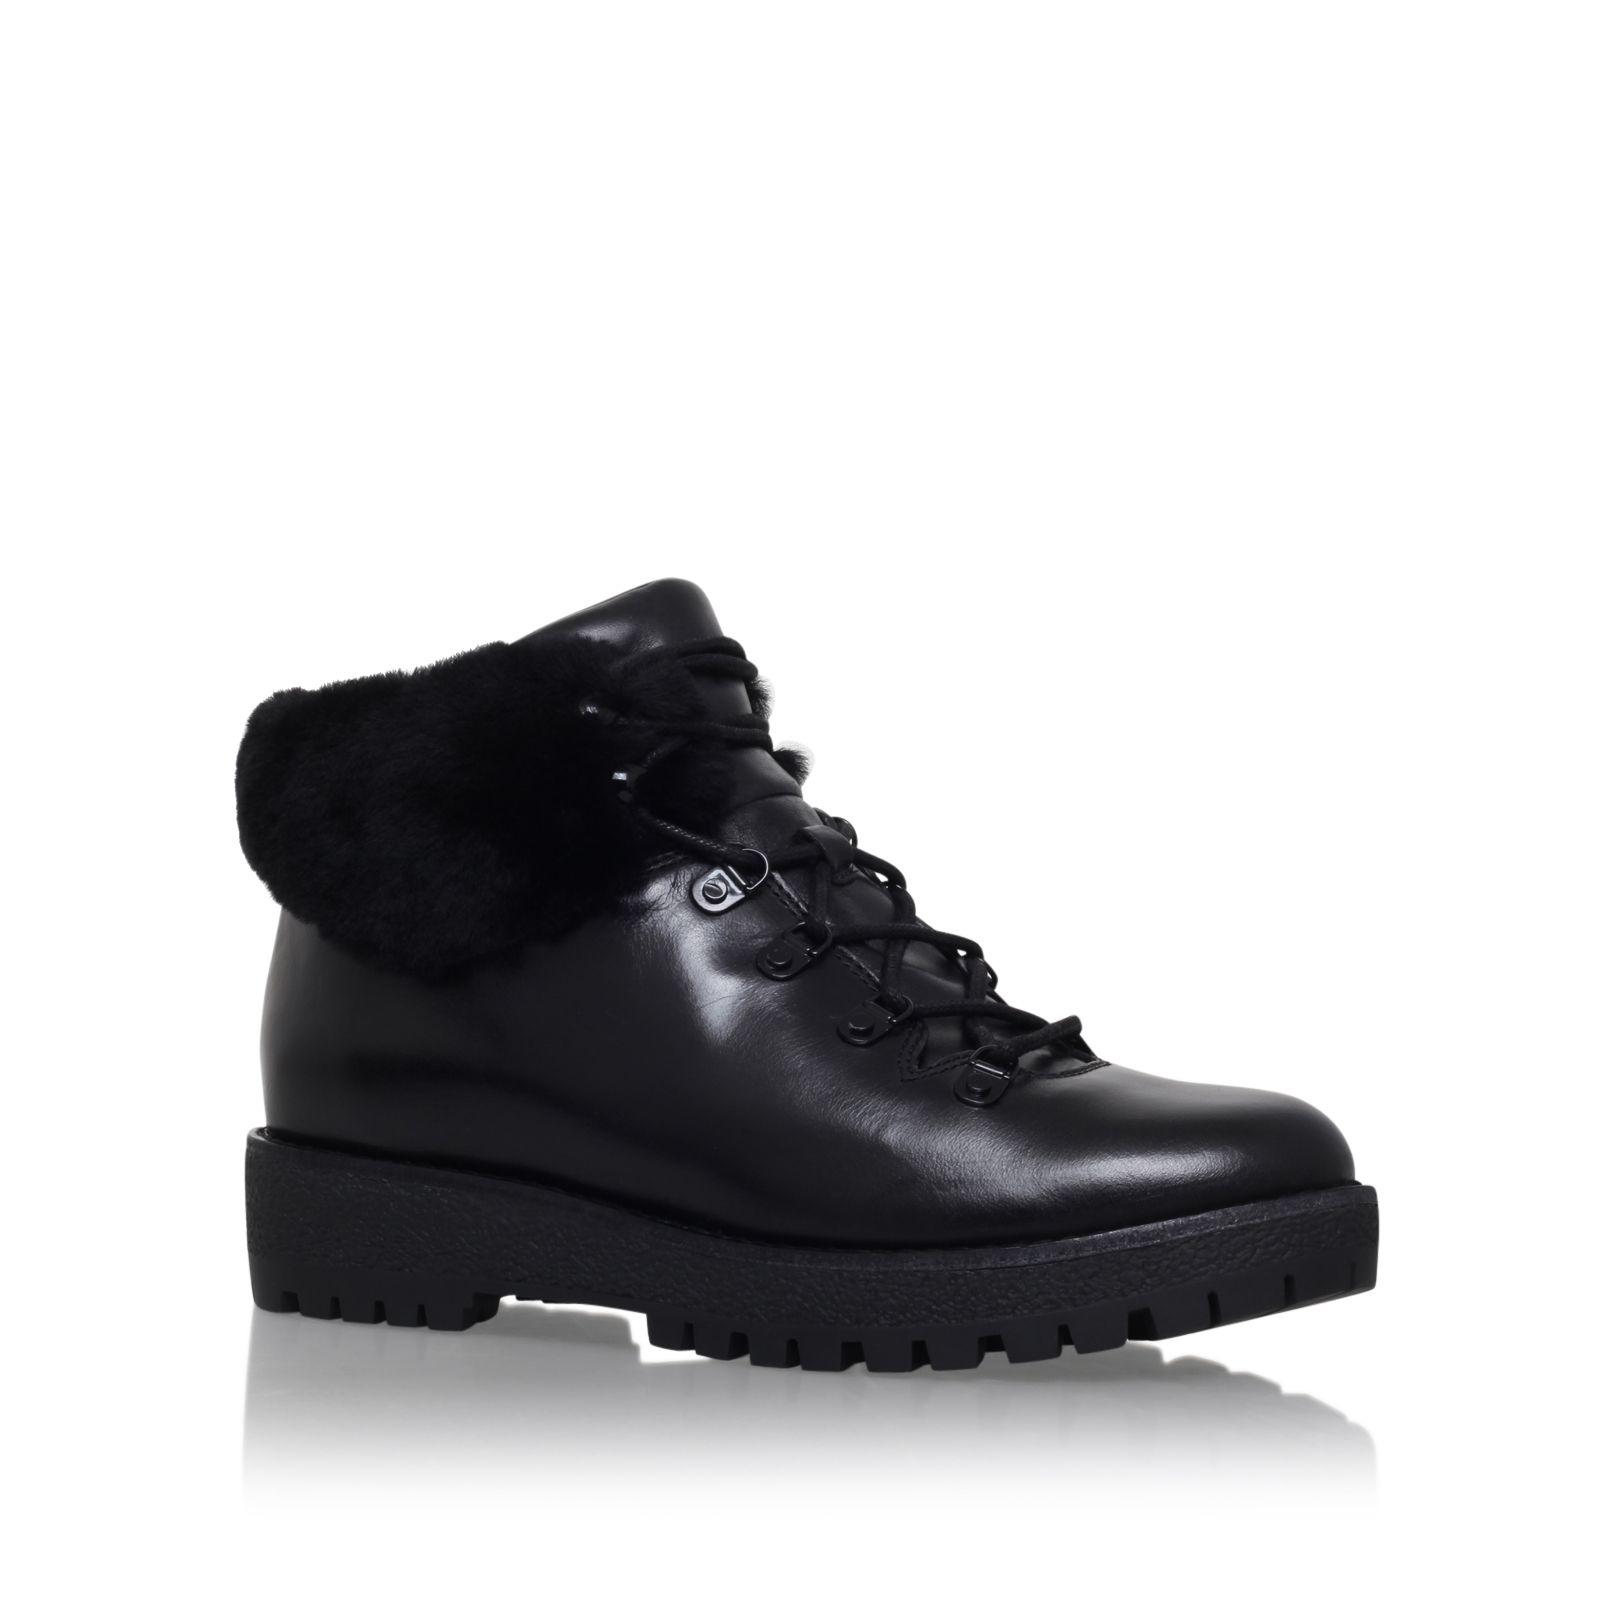 Michael kors Putnam Bootie Low Heel Ankle Boots in Black | Lyst